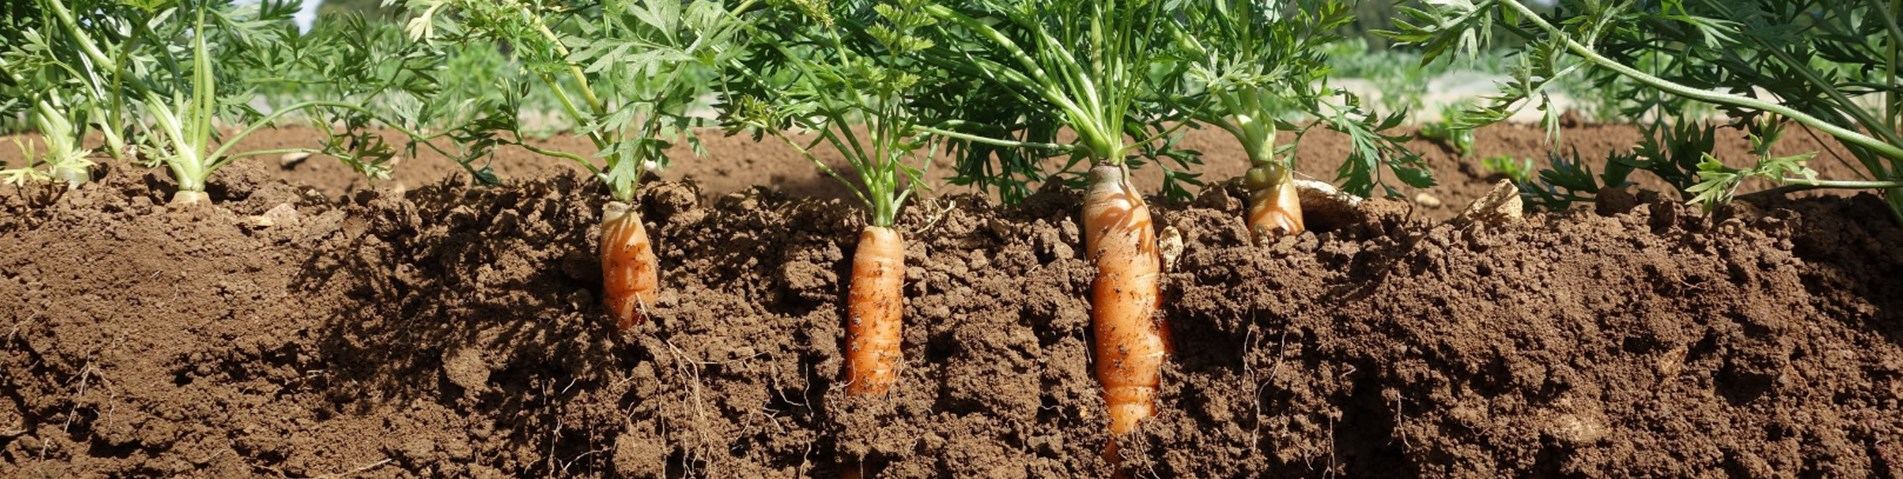 Drop in organic farmland despite growing market for Organic soil uk